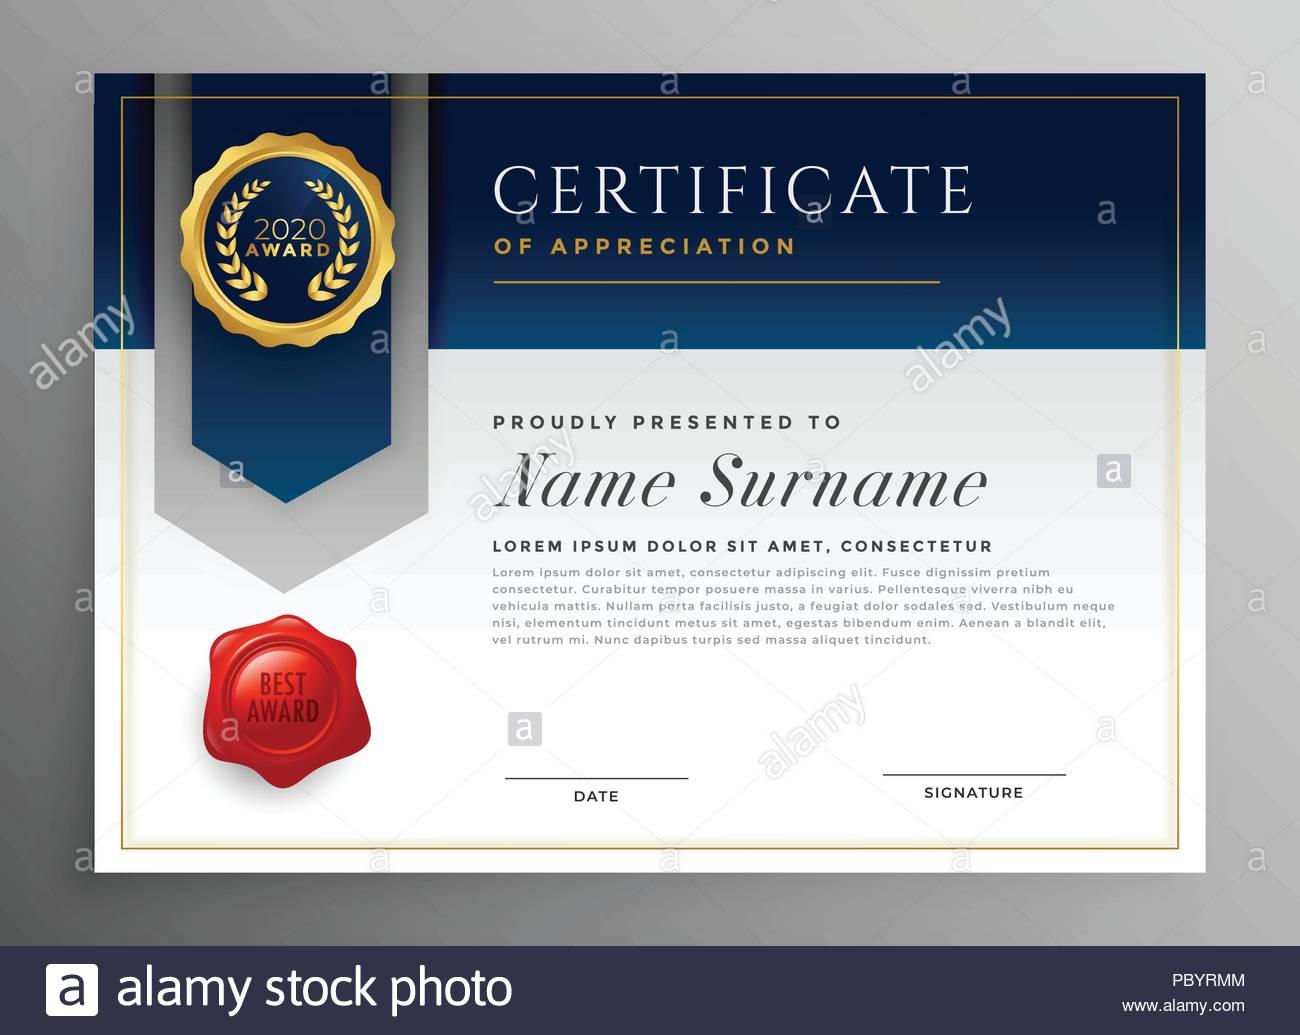 Professional Blue Certificate Template Design Stock Vector Art